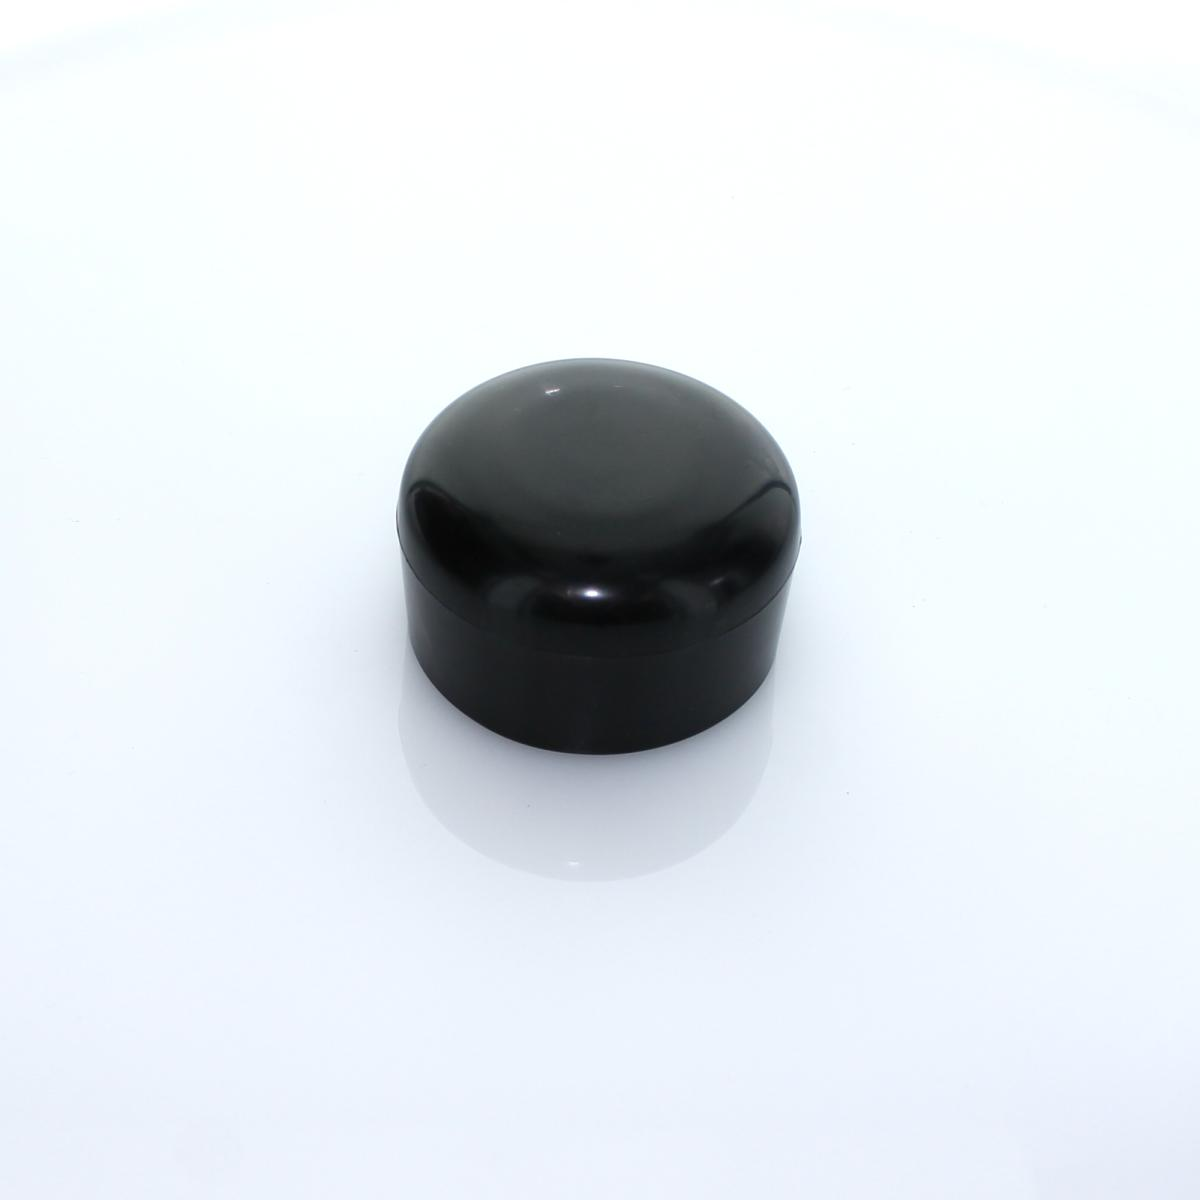 abdeckkappe schwarz 59 mm kunststoff abdeckkappe schwarz 59 mm kunststoff abdeckkappen. Black Bedroom Furniture Sets. Home Design Ideas